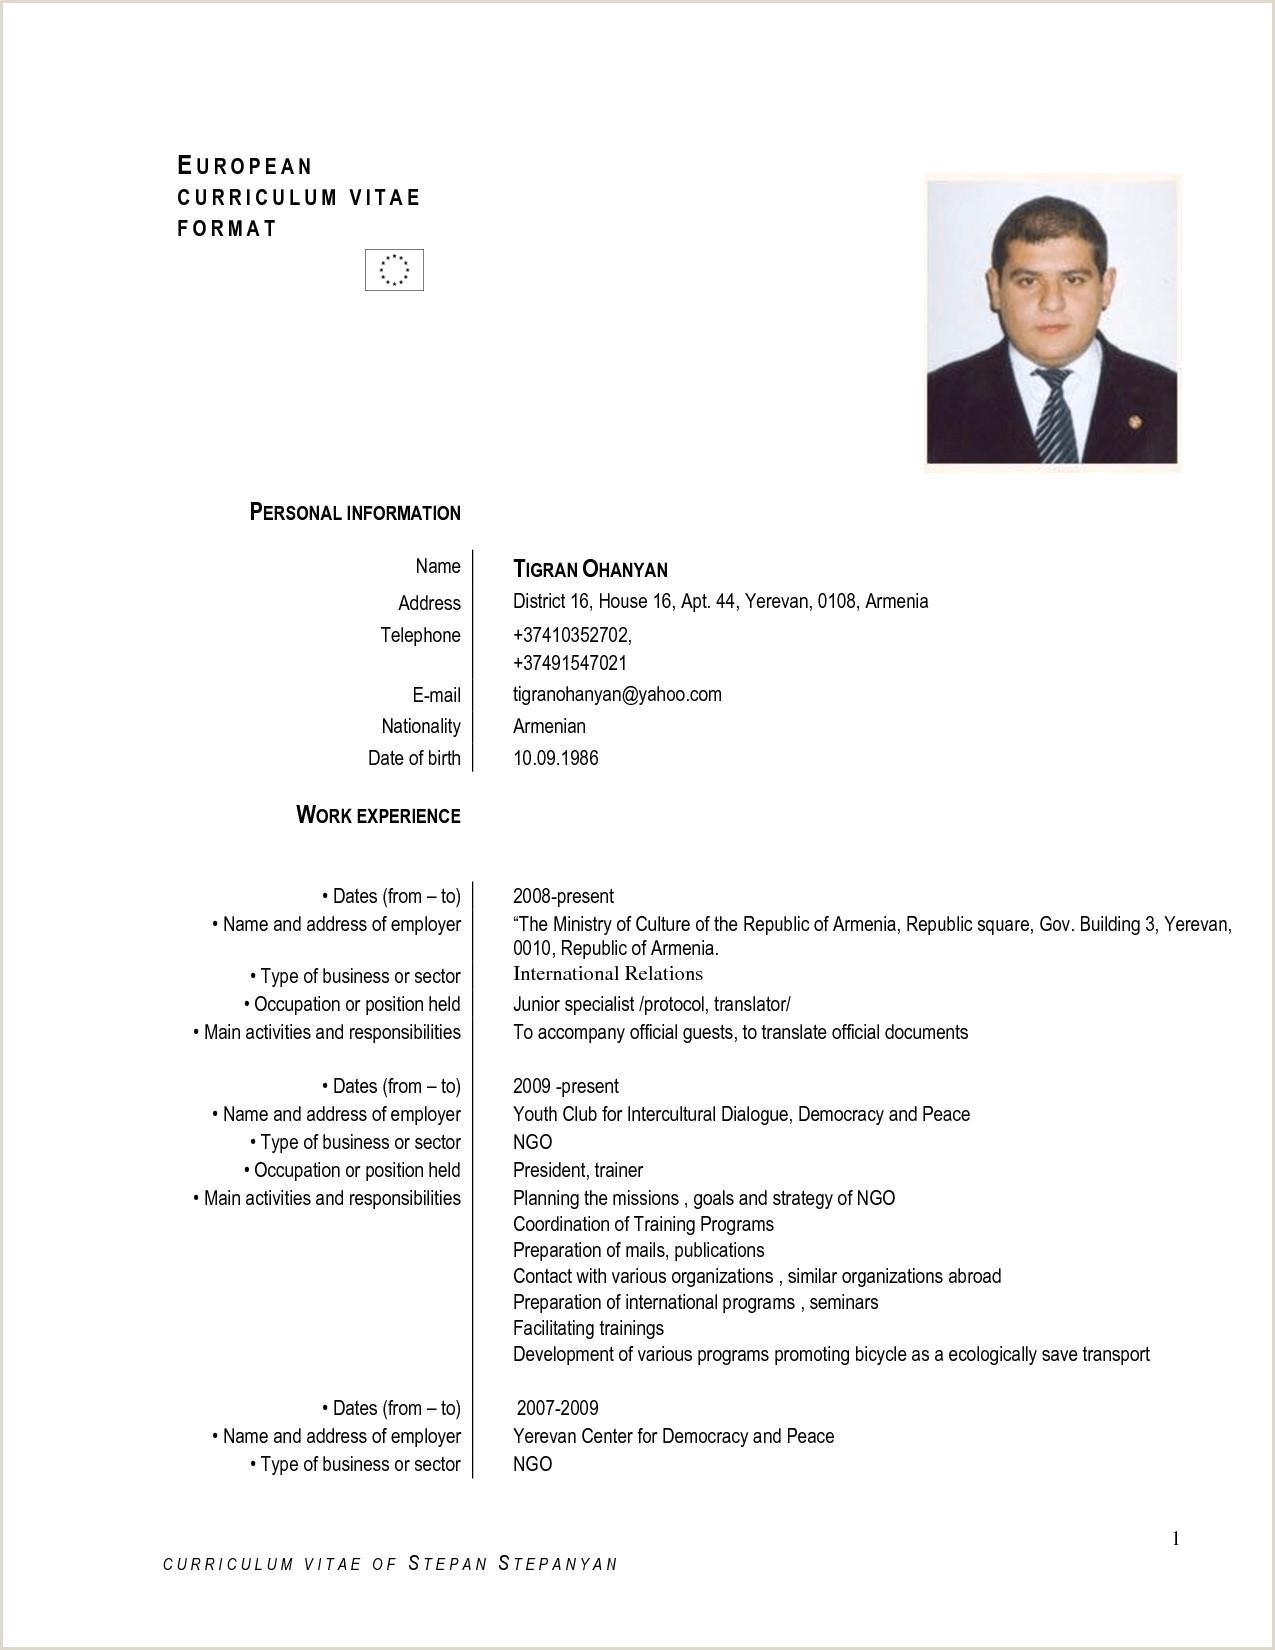 Cv Format For Ngo Job Curriculum Vitae Nepali Cv Format